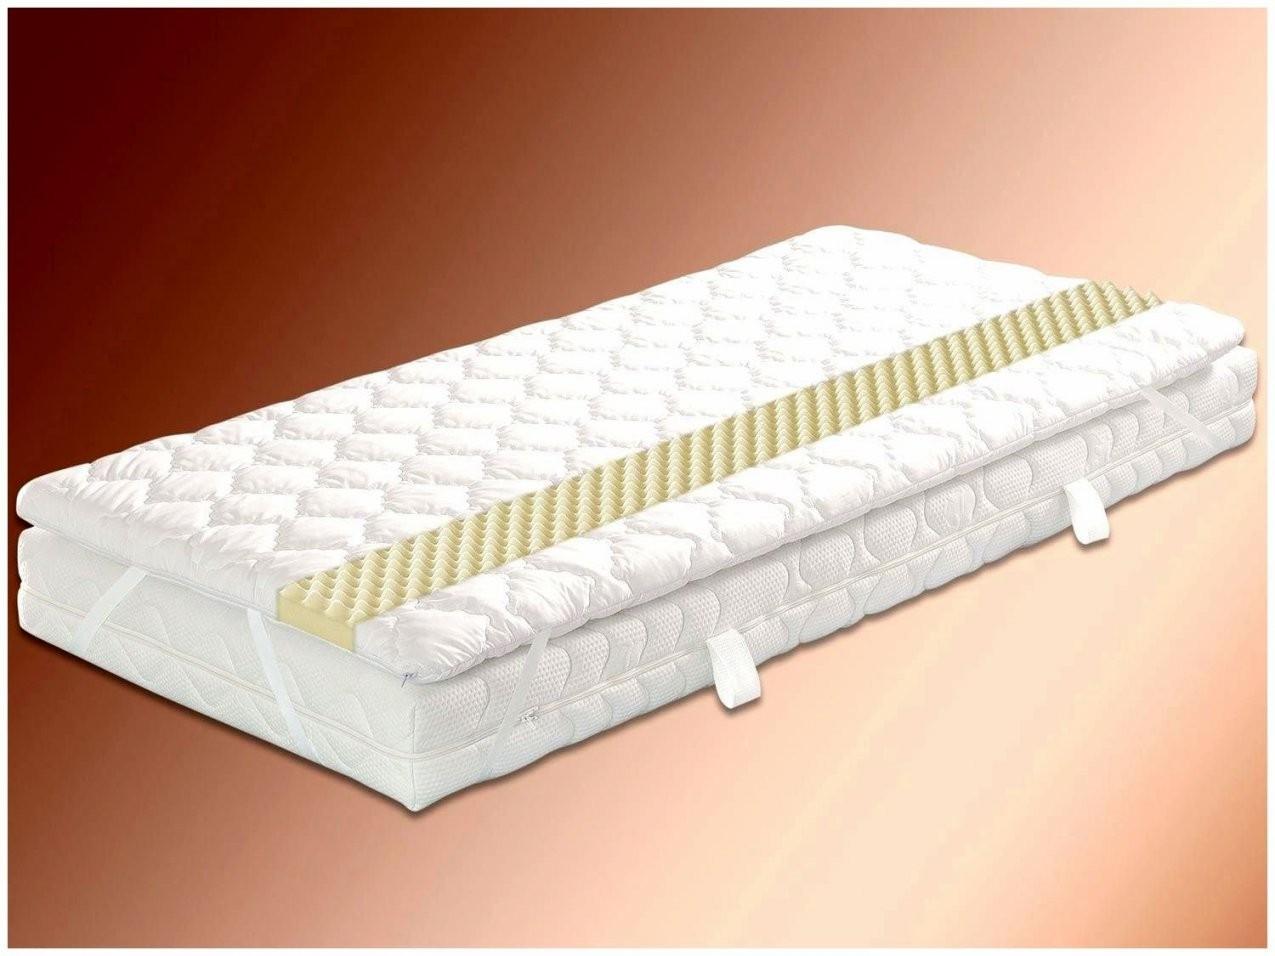 Hervorragend Dormia Matratzen Topper Sleep Care Test Siegen 471000 von Dormia Matratzen Topper Photo